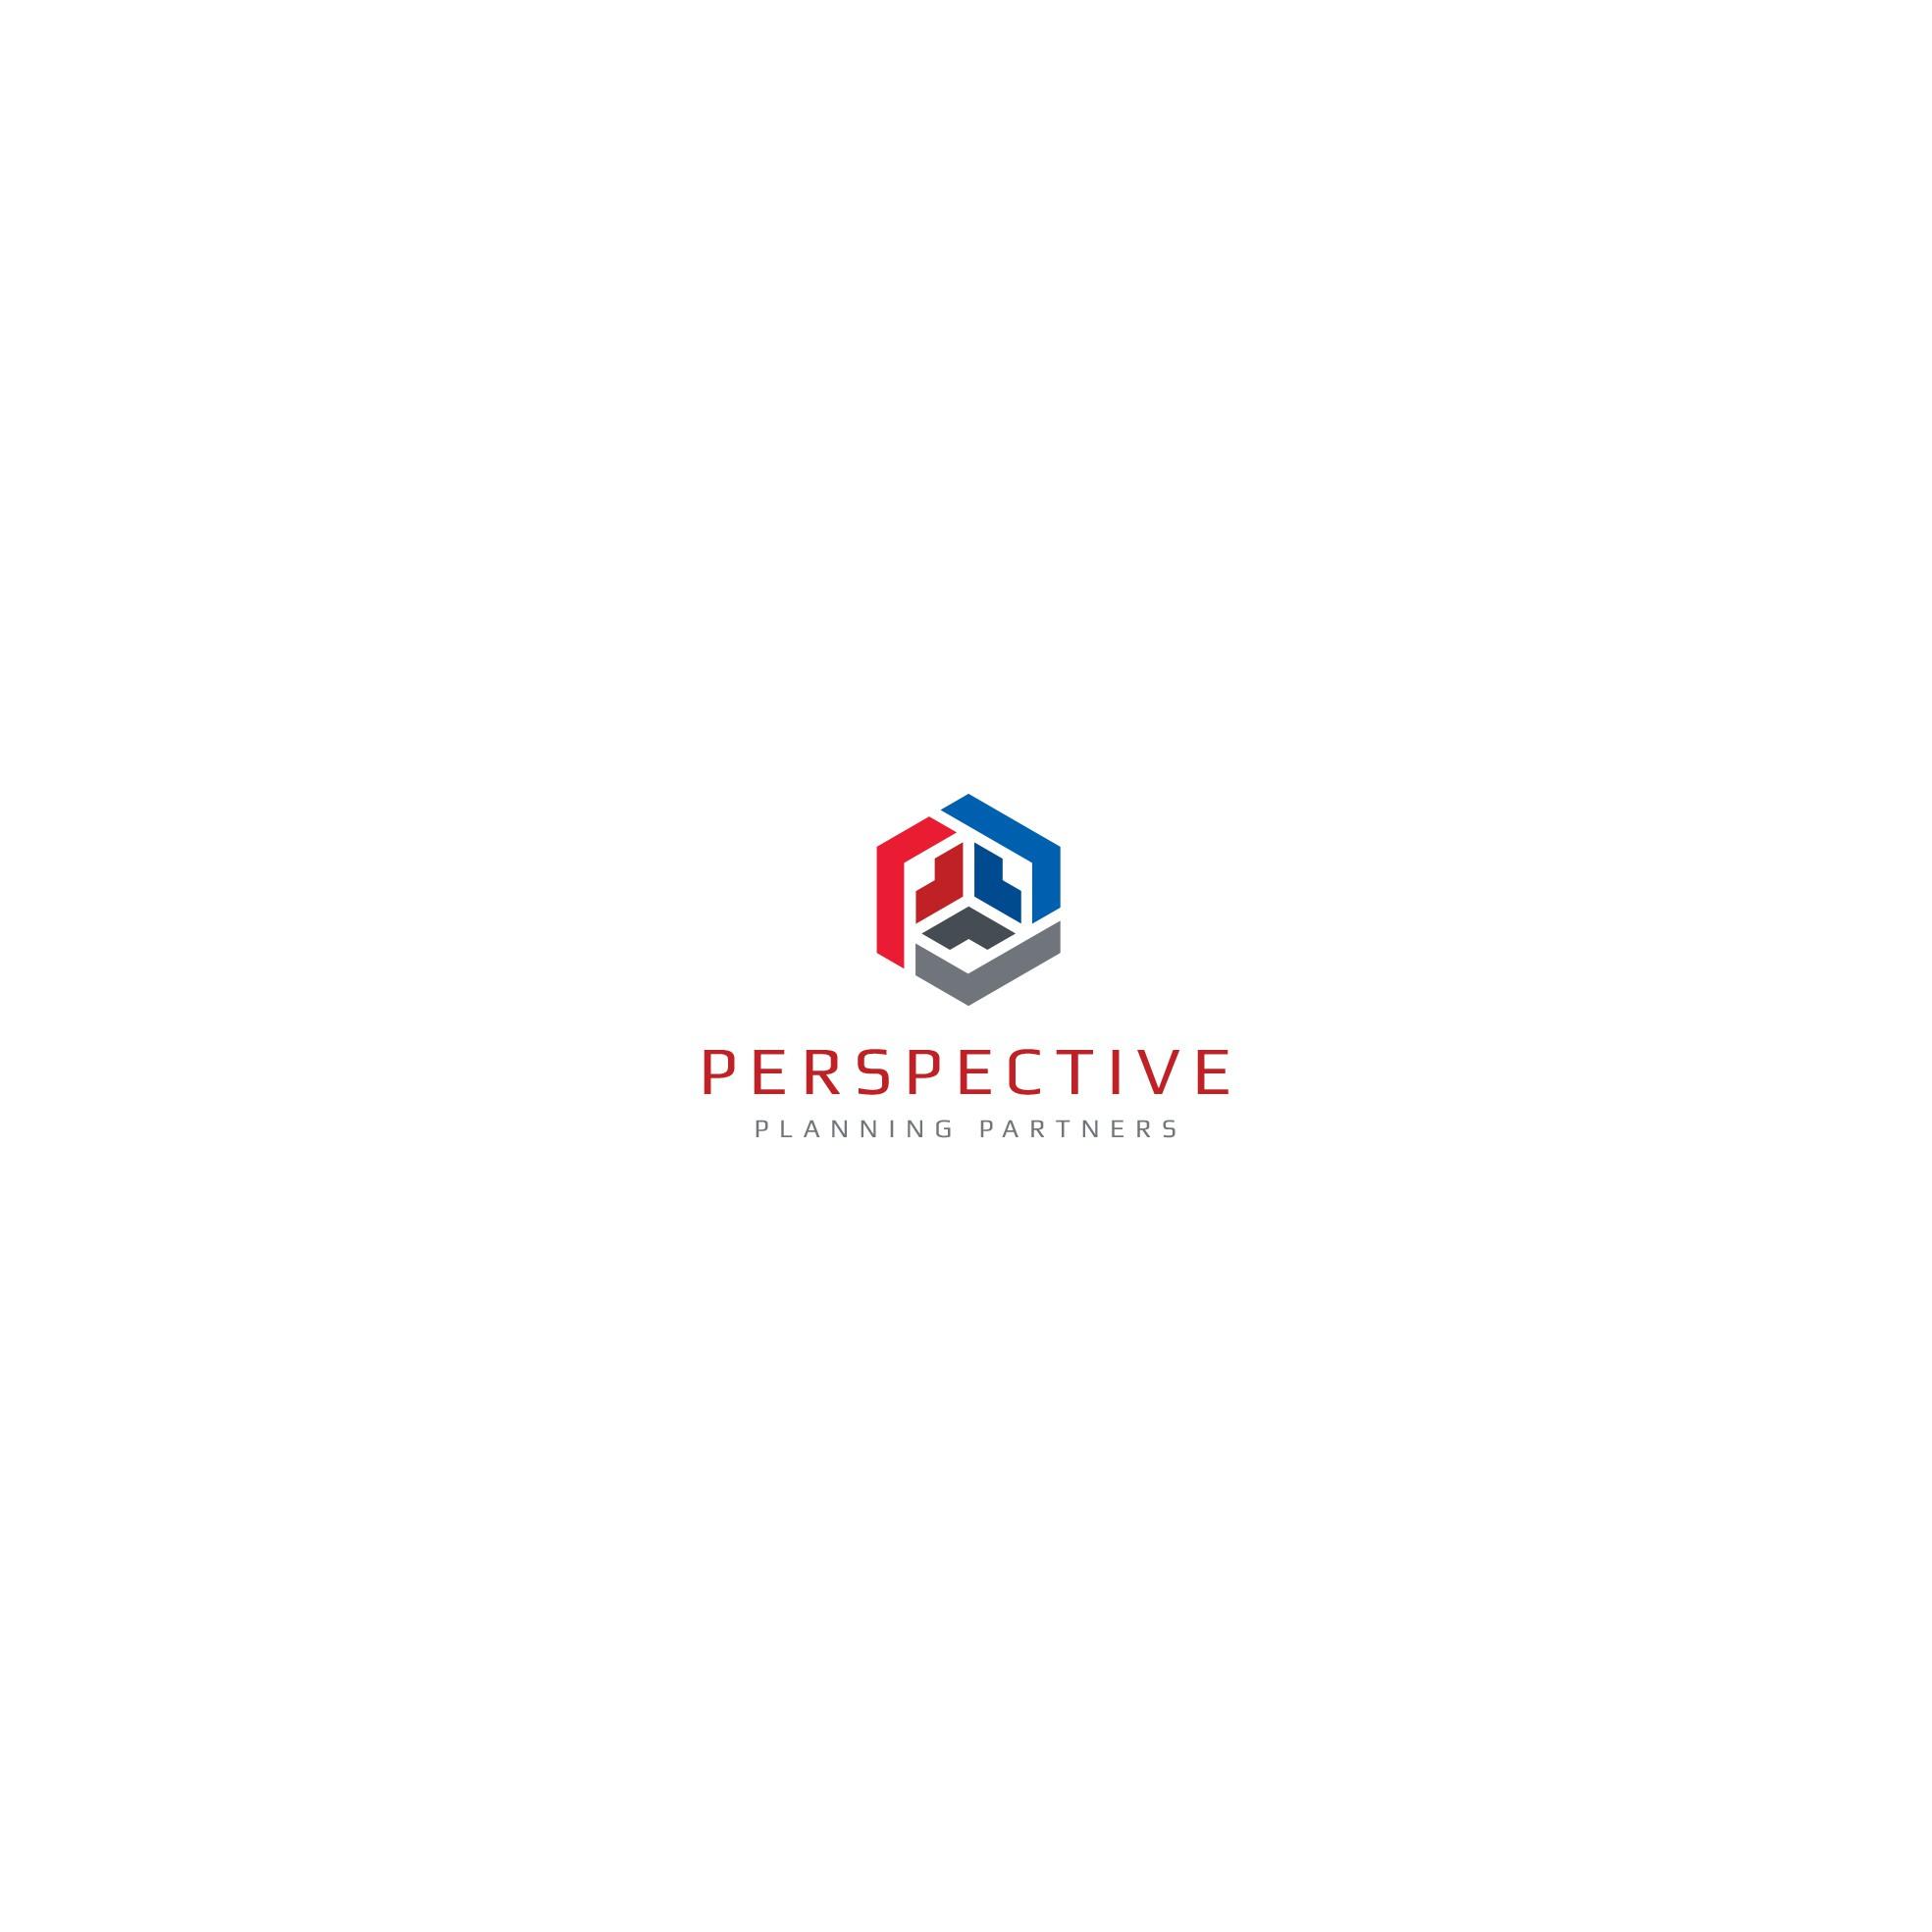 NEW Financial Planning Practice needs new logo